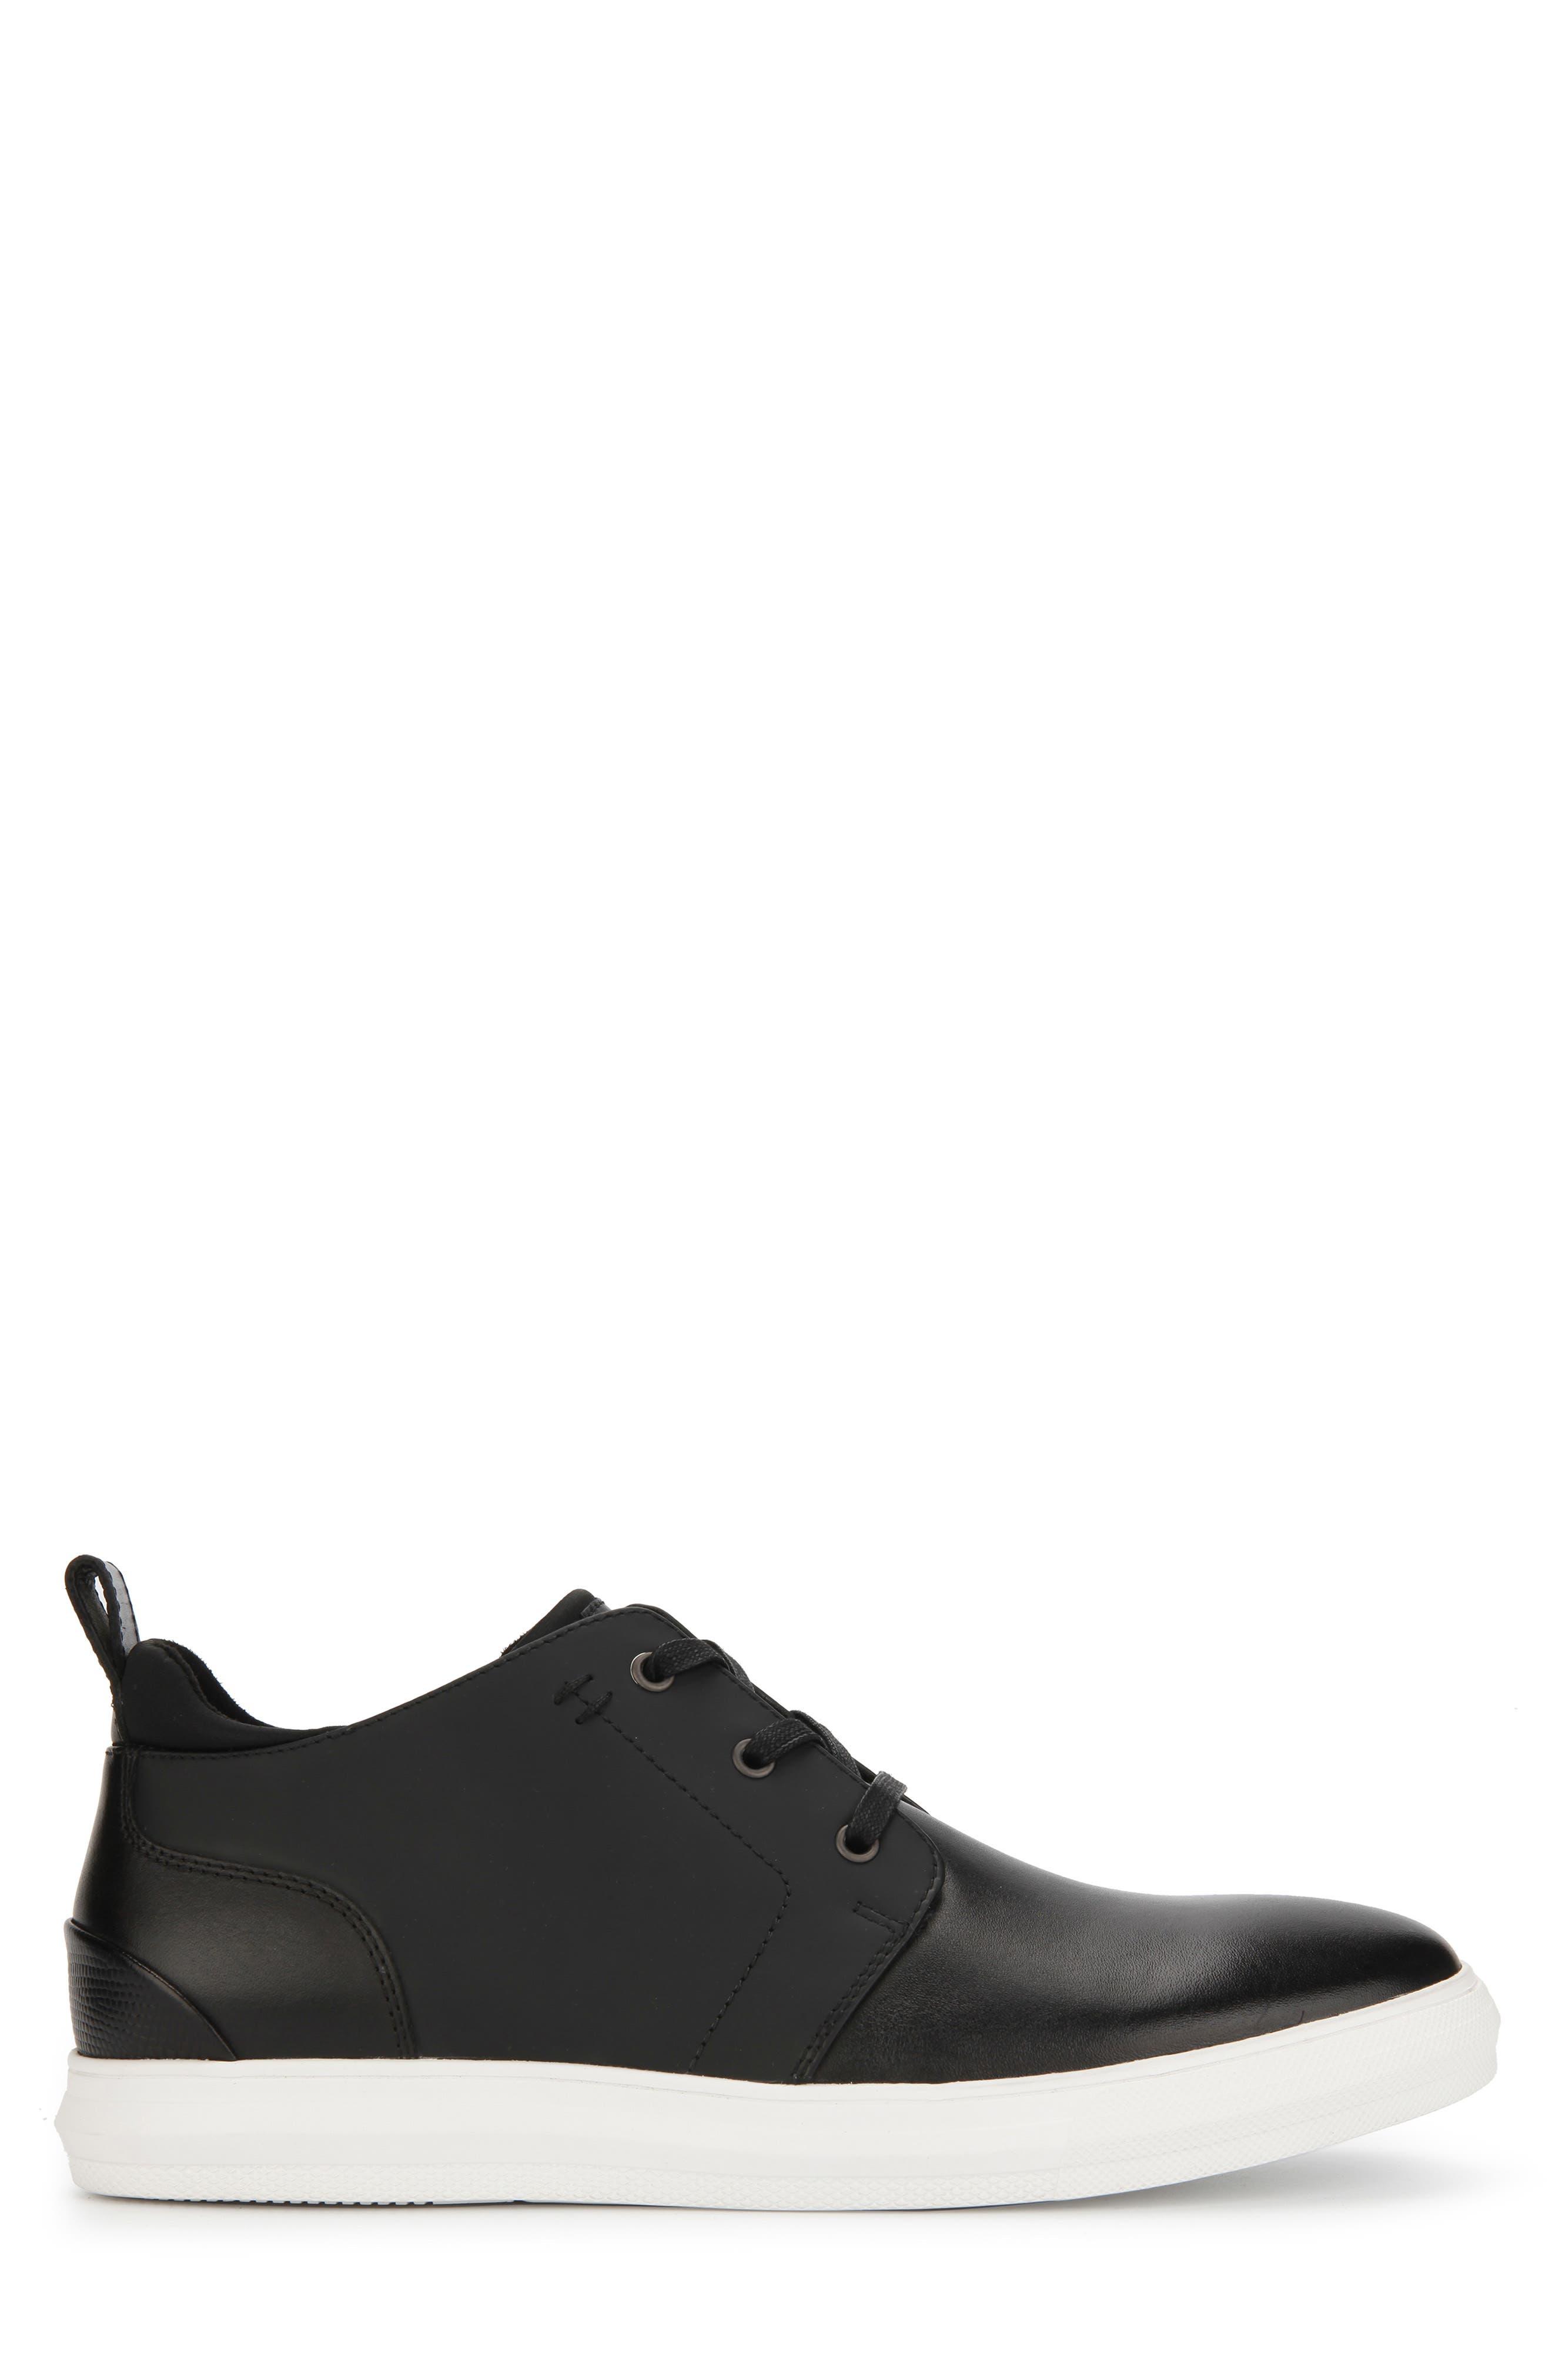 REACTION KENNETH COLE, Reemer Chukka Sneaker, Alternate thumbnail 2, color, BLACK